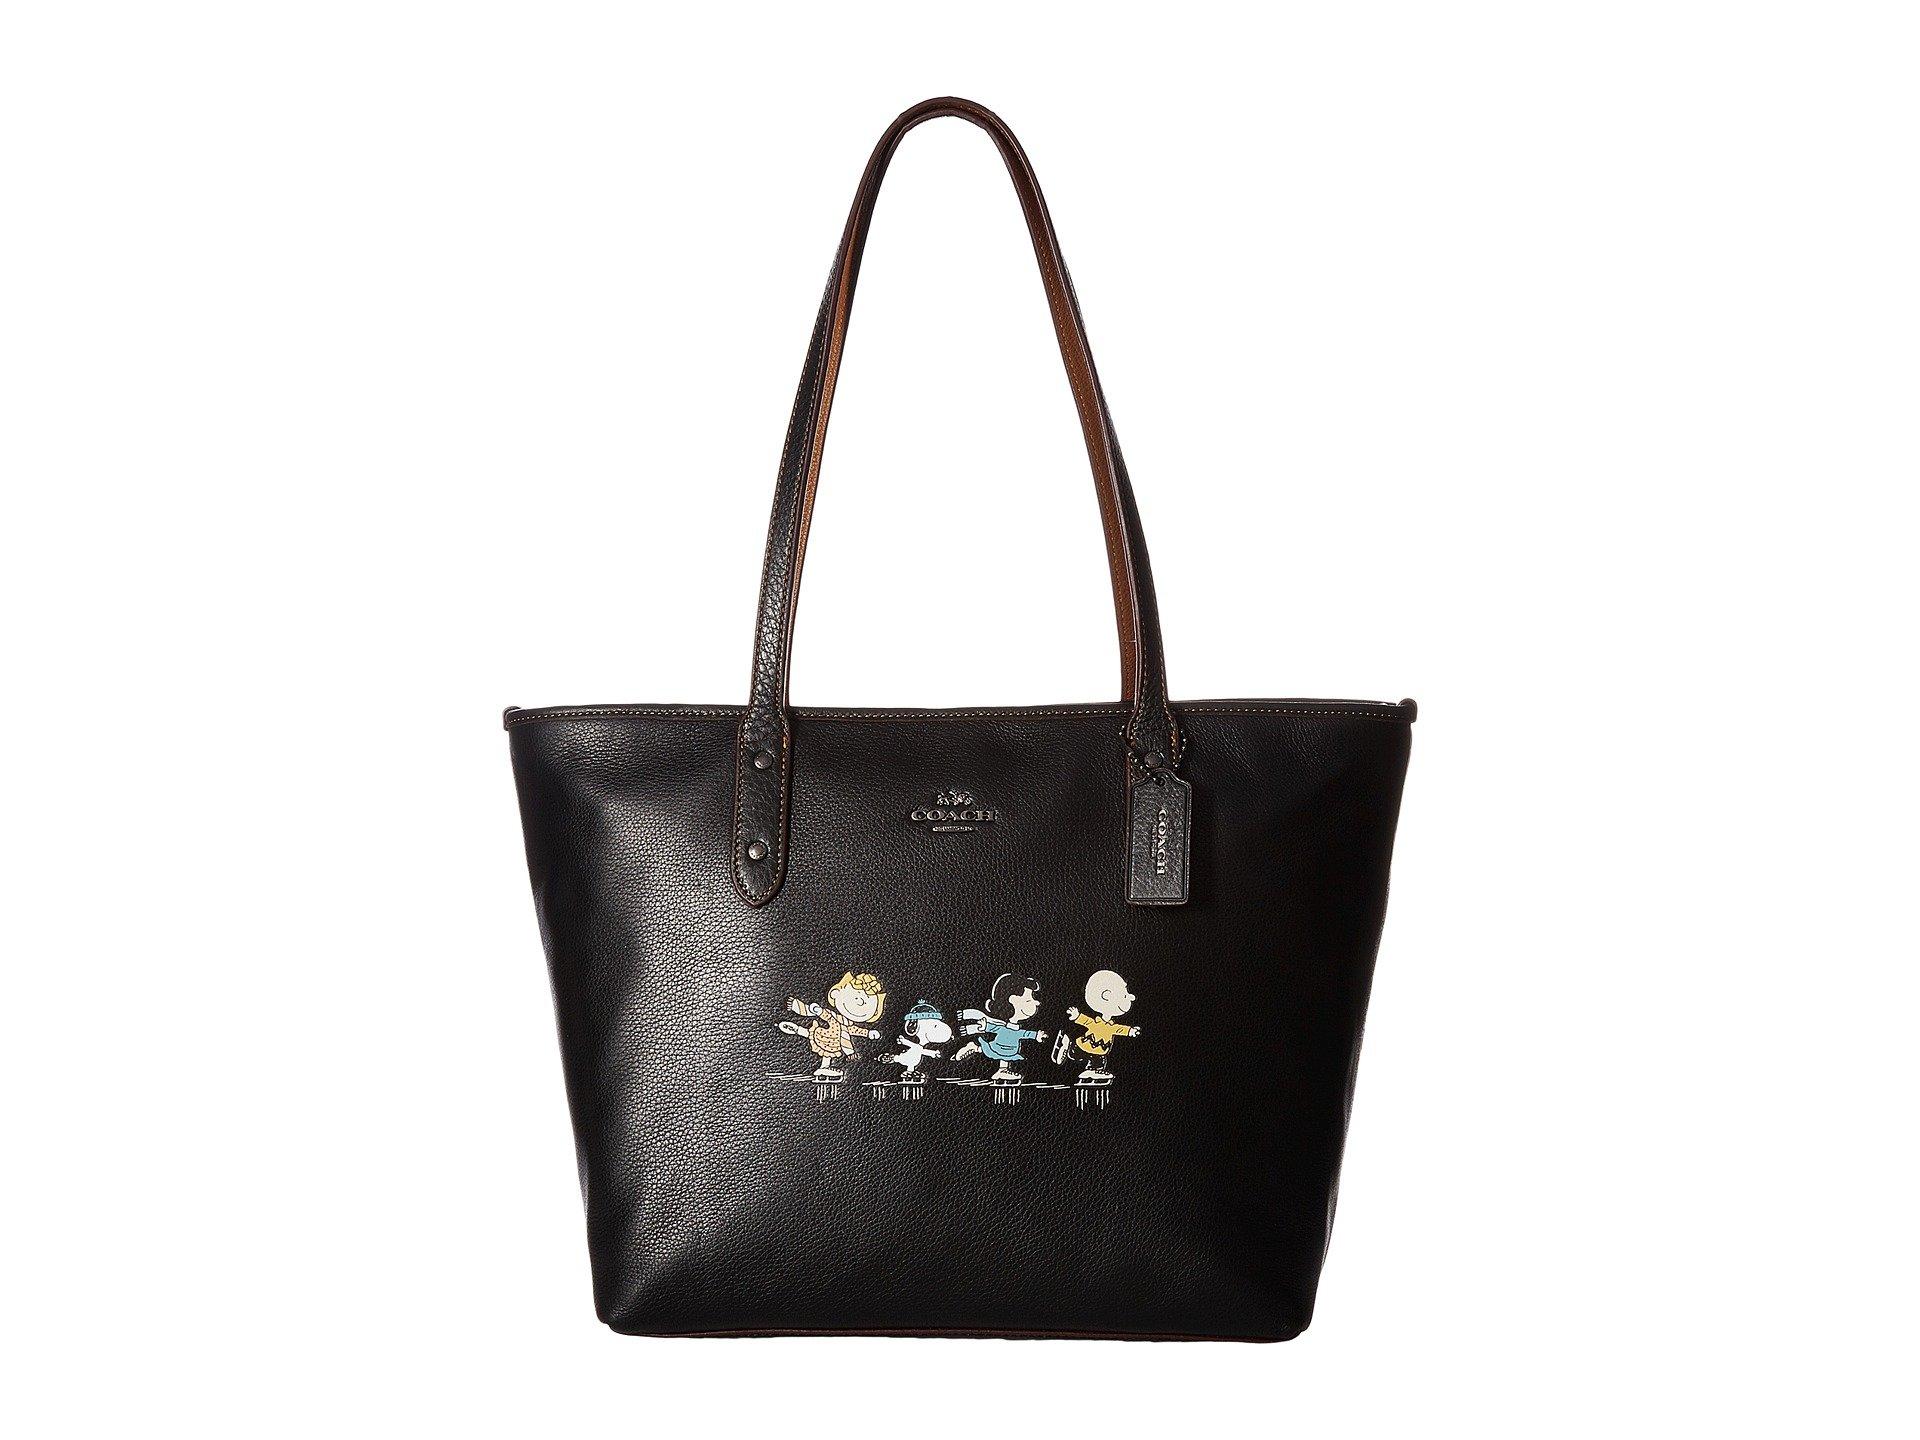 COACH Women's Snoopy City Zip Tote Qb/Black One Size